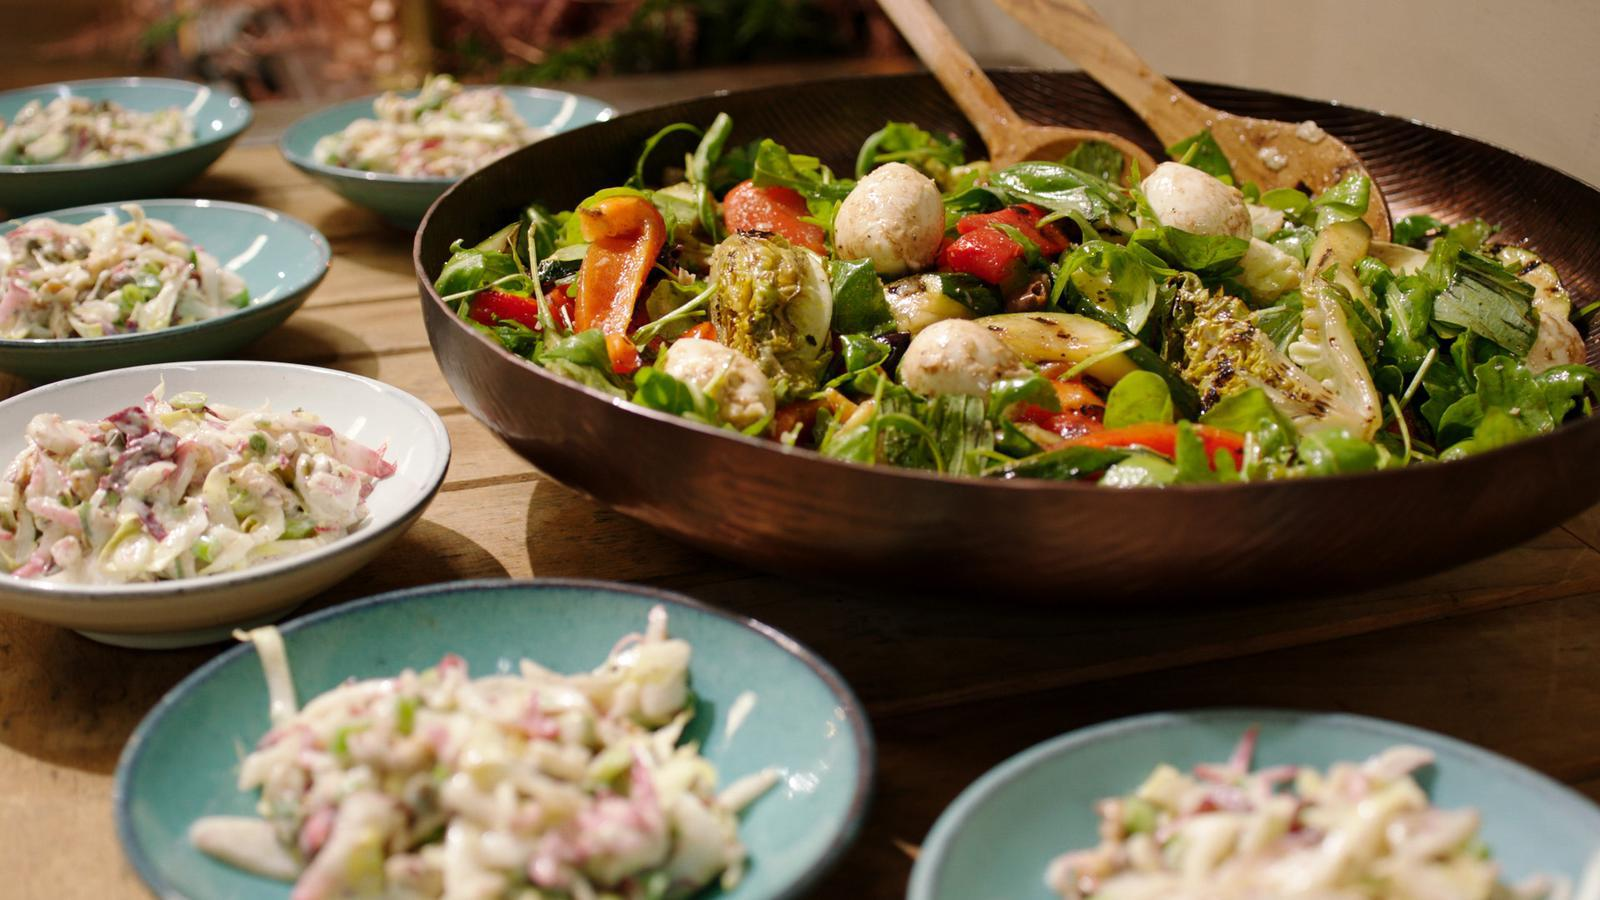 Bocconcini met gegrilde groenten en witloofsalade met yoghurtdressing